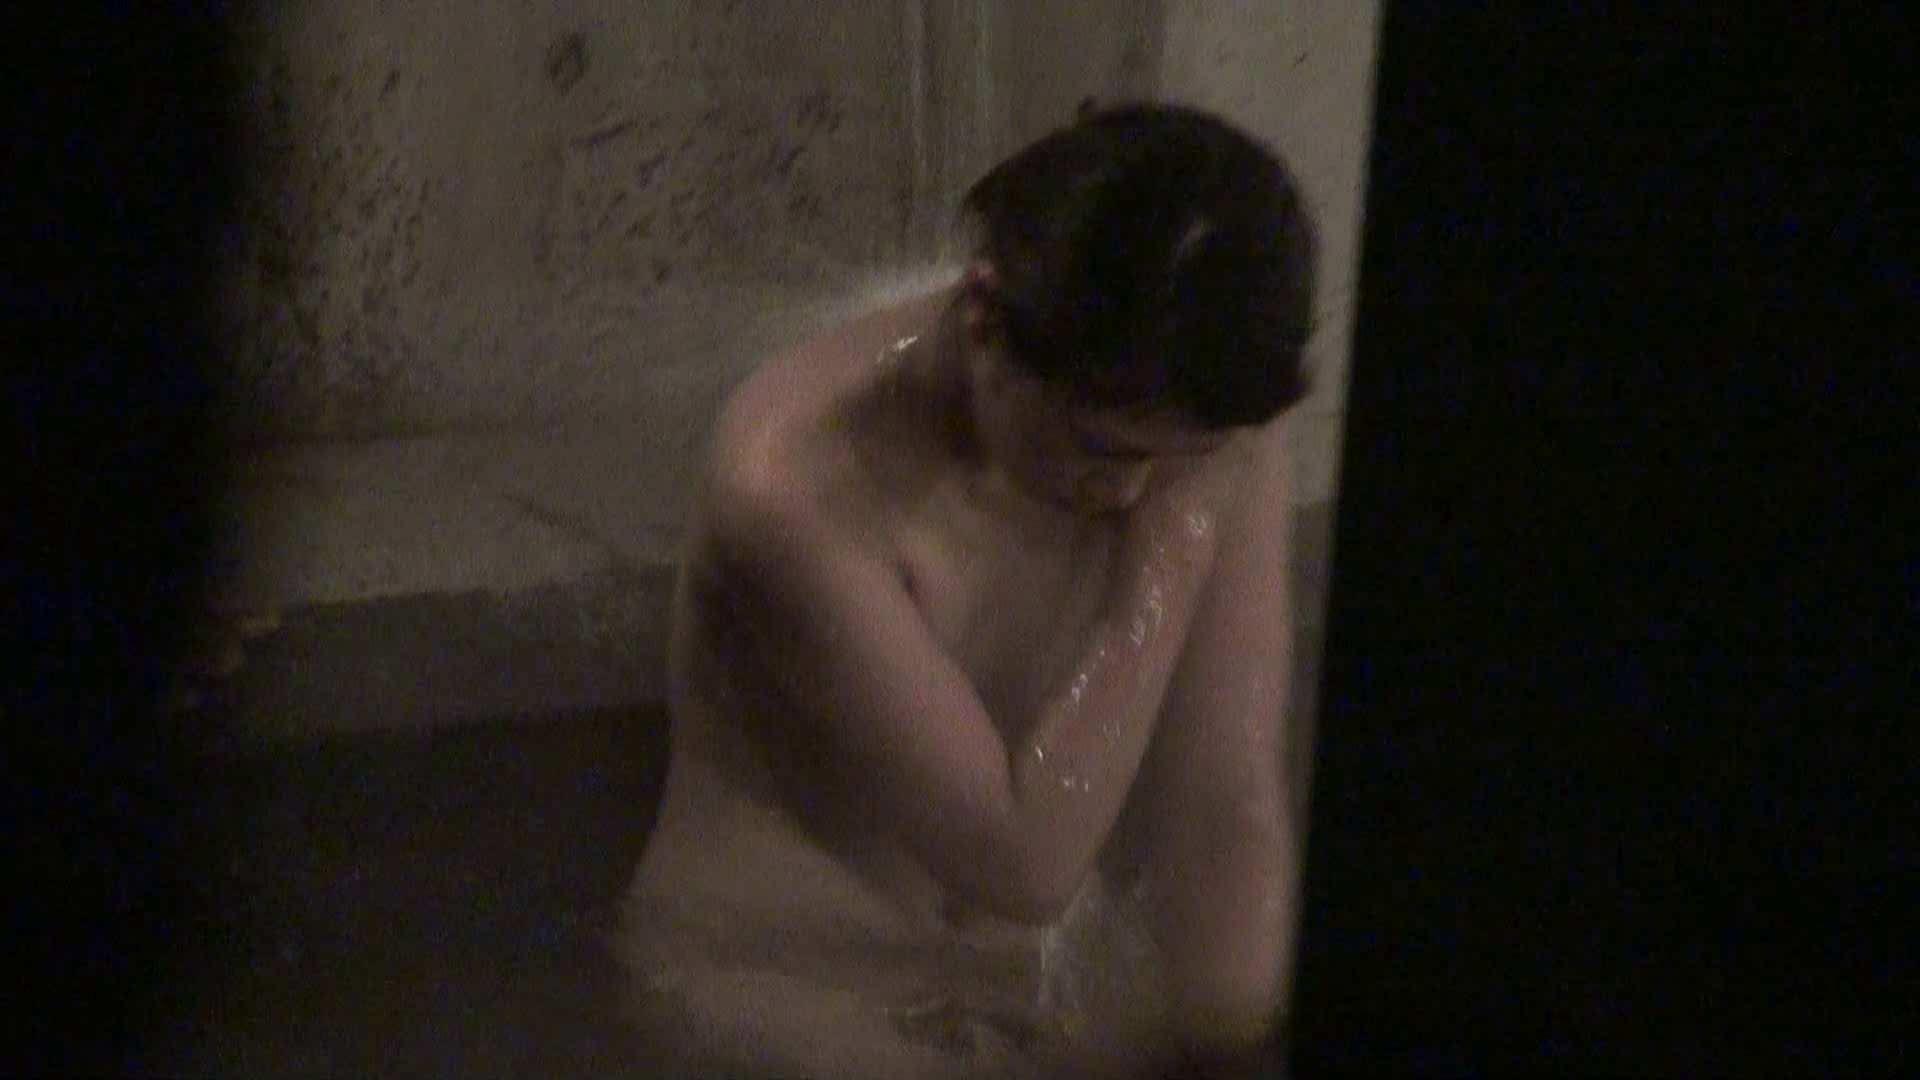 Aquaな露天風呂Vol.426 OLセックス 盗み撮りオマンコ動画キャプチャ 106画像 41